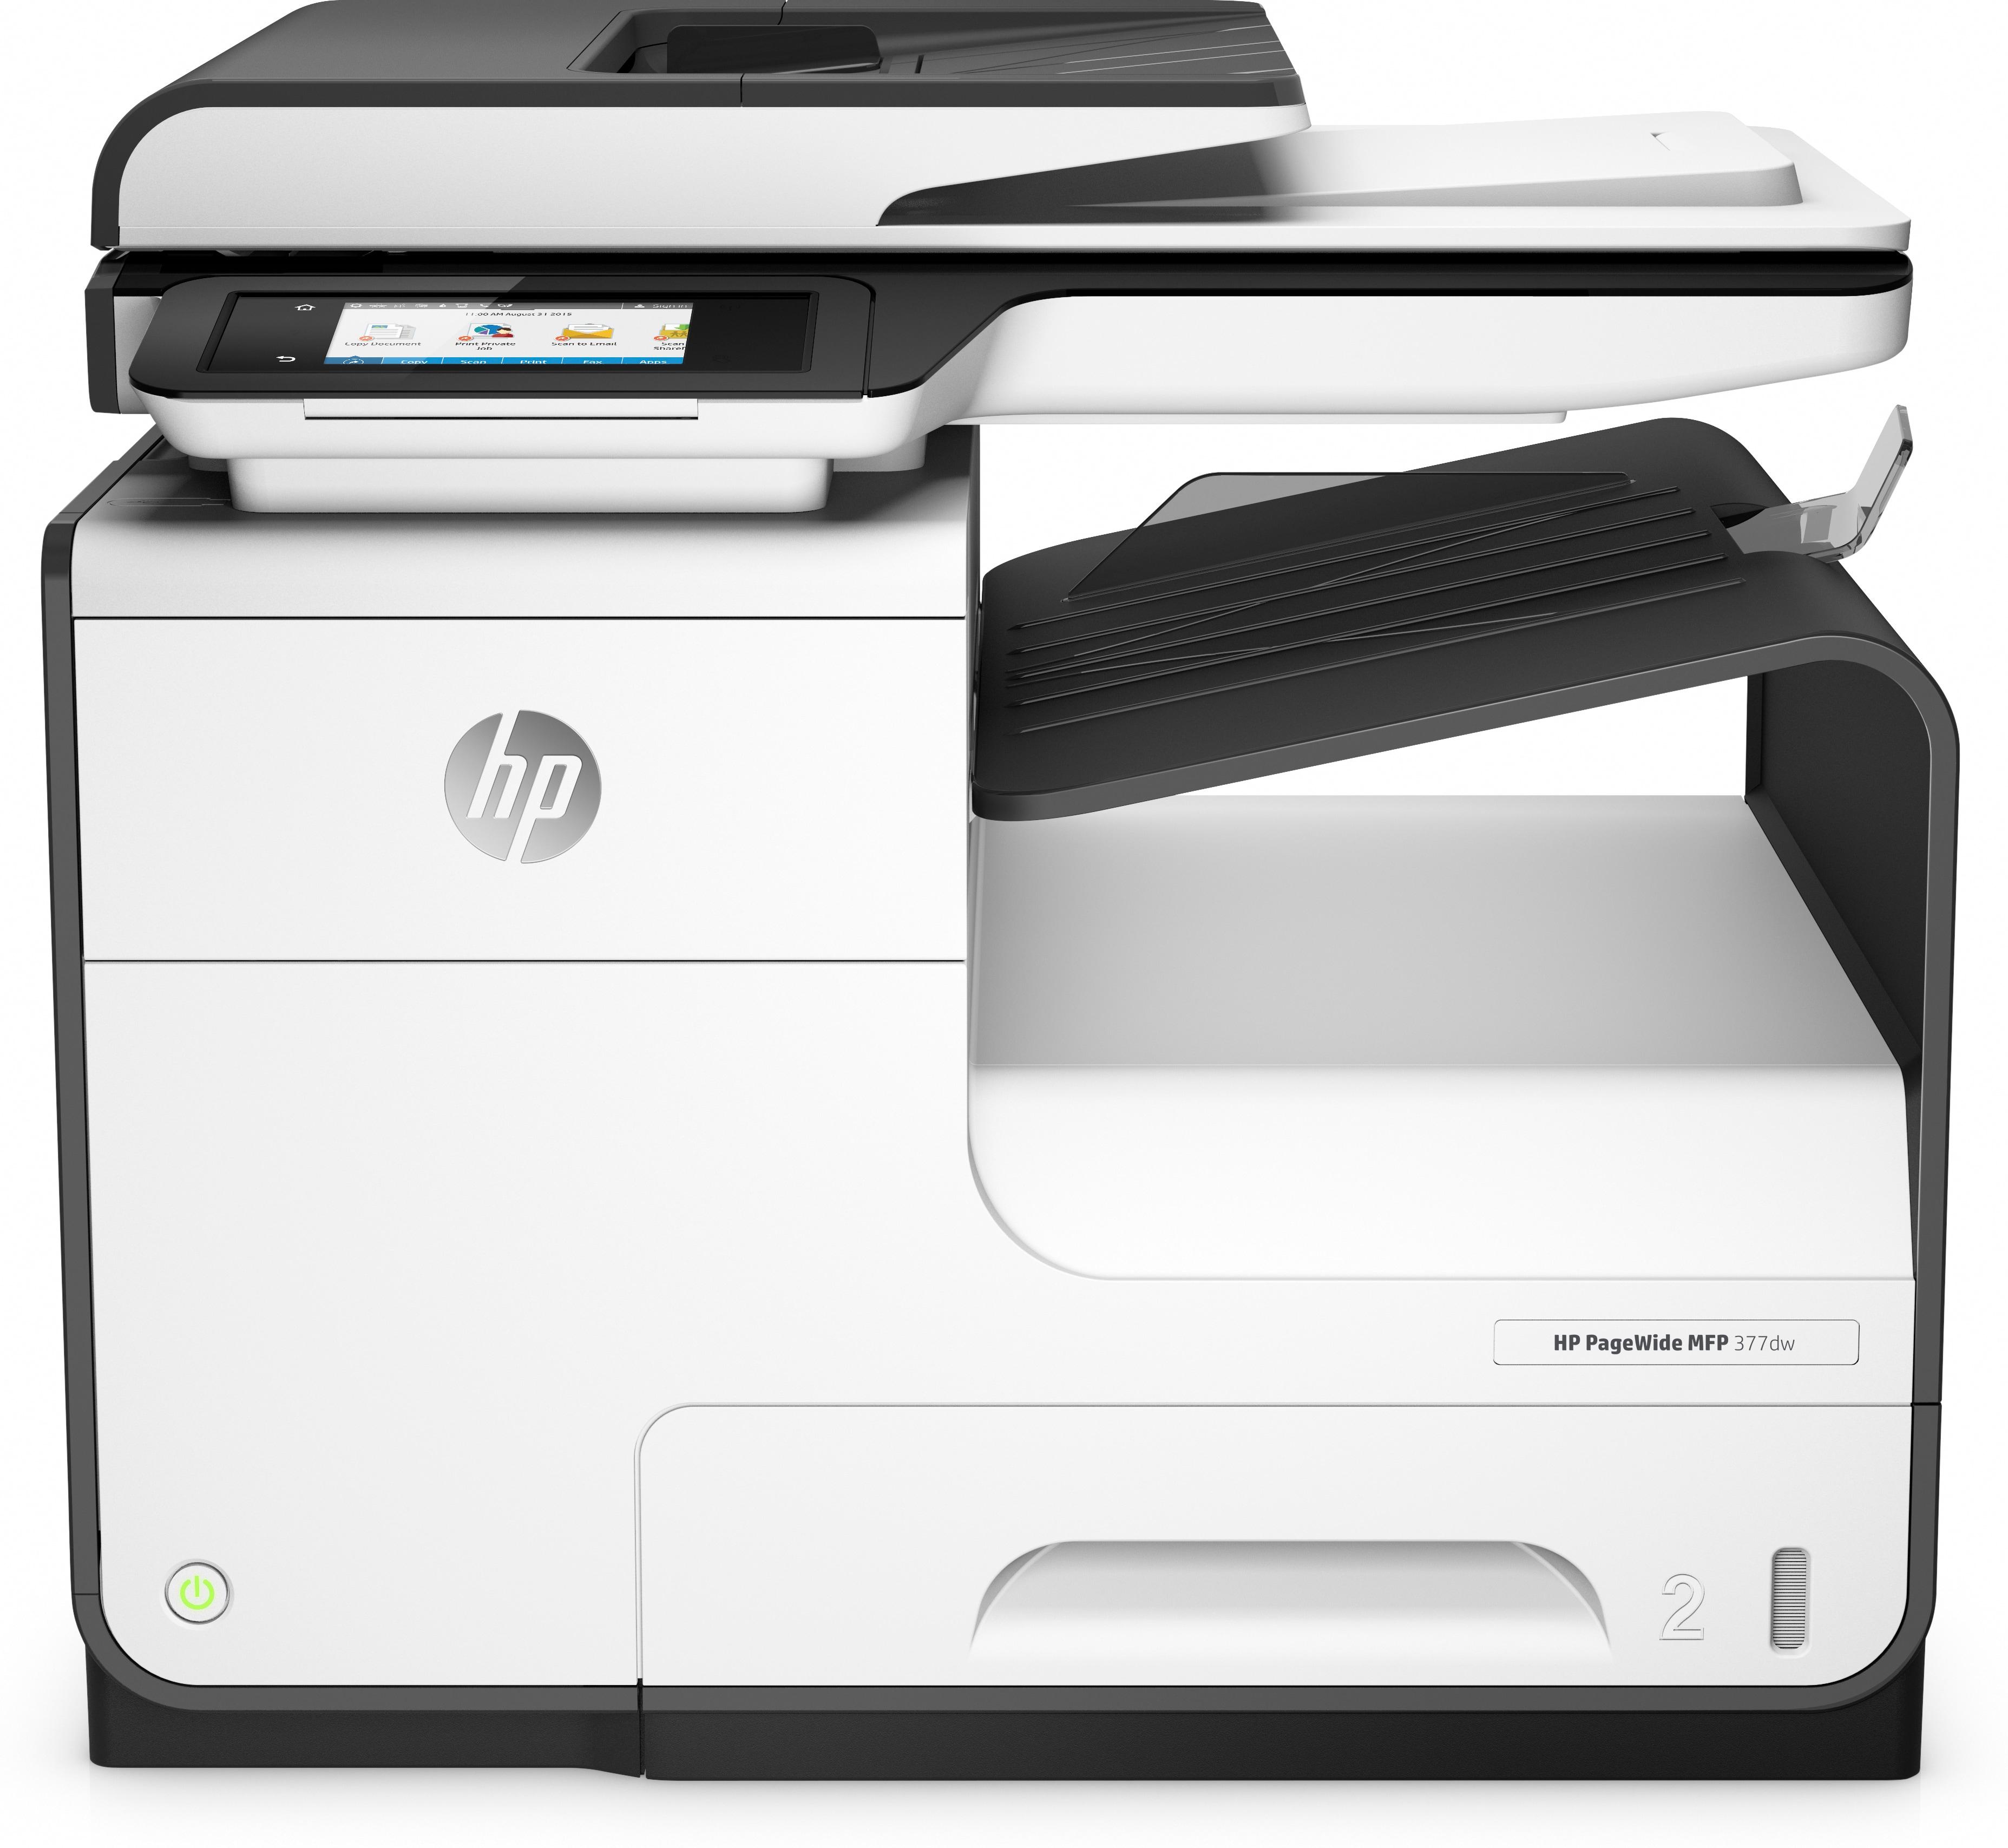 PageWide MFP 377dw Multifunction printer (A4, 45 ppm, USB 2.0, LAN, Wi-Fi, NFC)